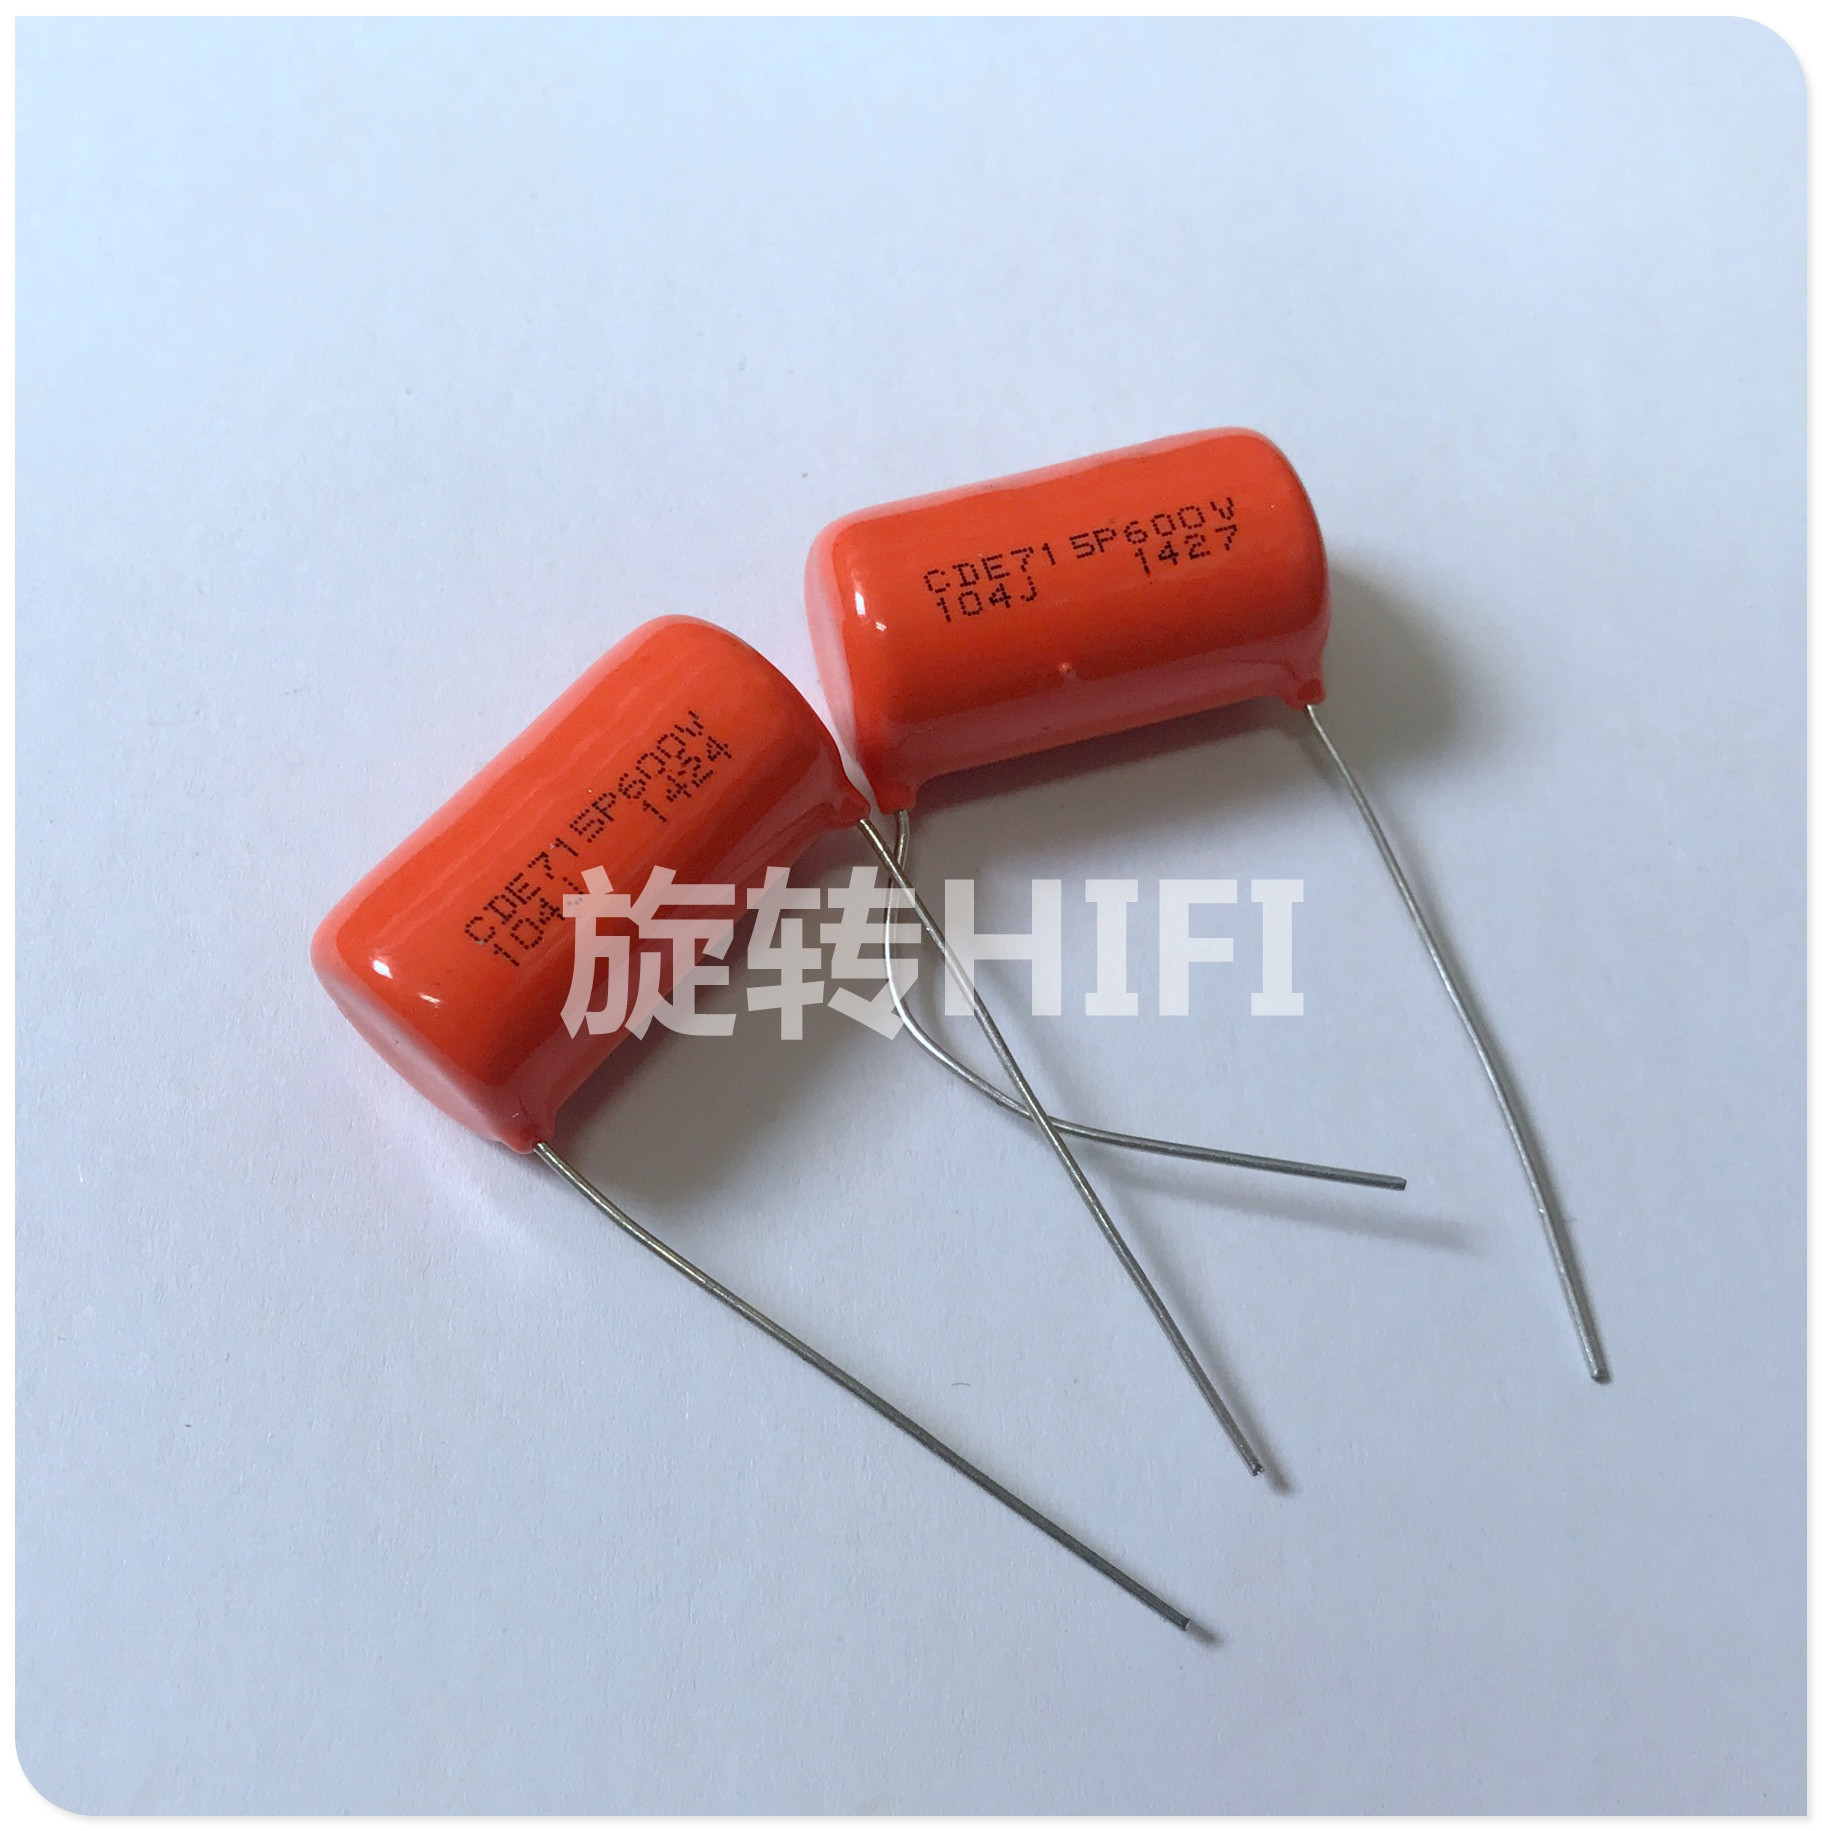 10PCS CDE SPRAGUE CDE715P 600V 0.1UF P28MM Orange Fever Film Capacitor MKP SBE 715P 104 600V 100NF 104/600V